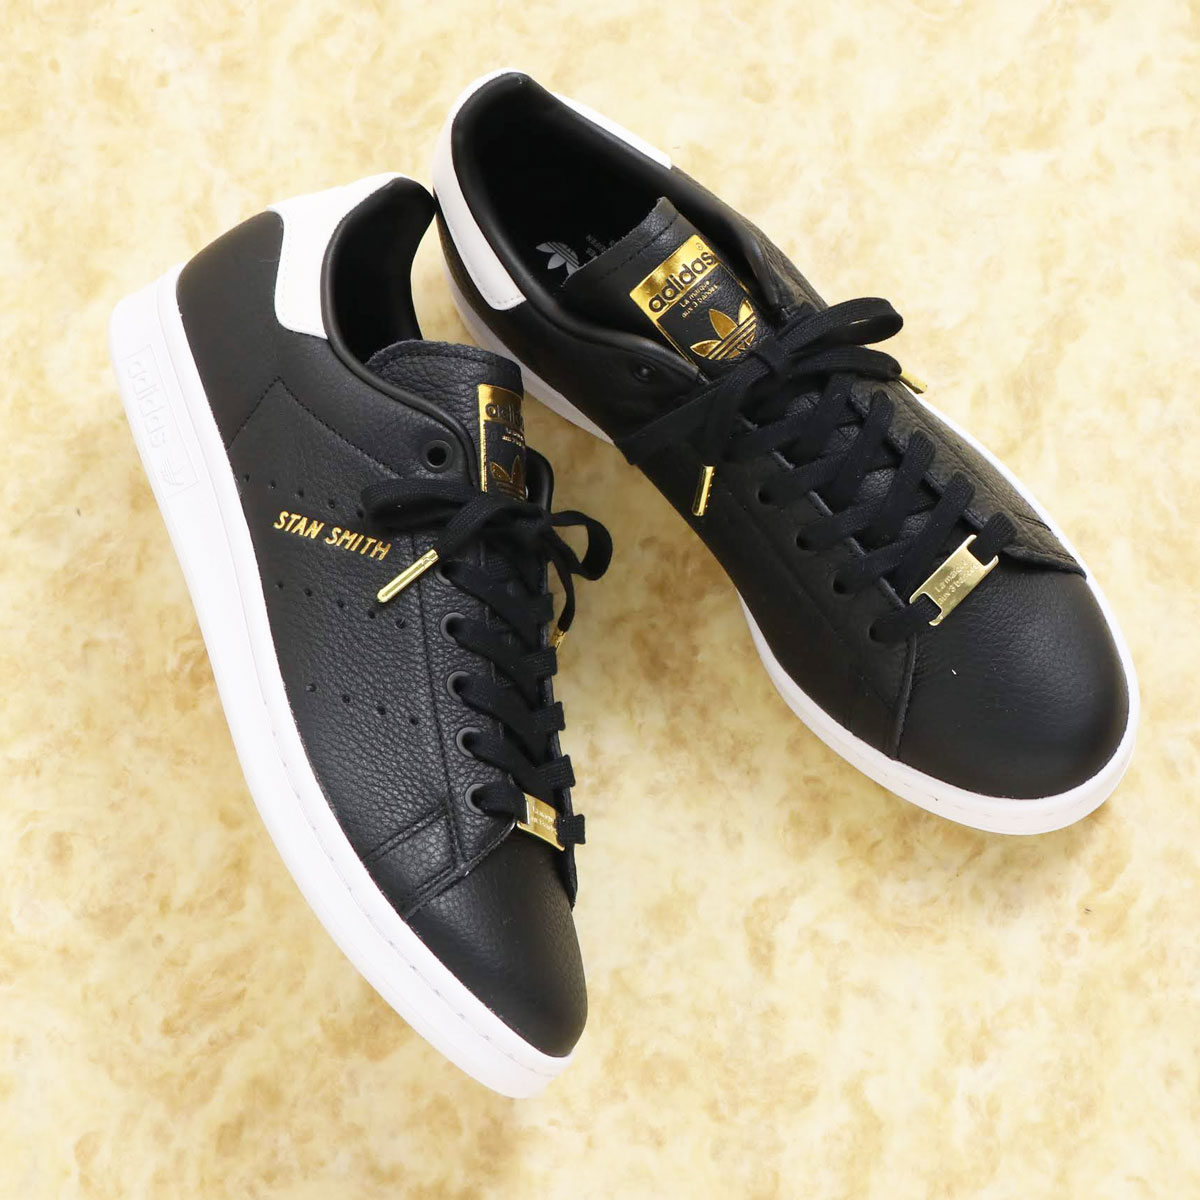 adidas STAN SMITH(アディダス スタンスミス)CORE BLACK/CORE BLACK/FOOTWEAR WHITE【メンズ レディース スニーカー】20SS-I